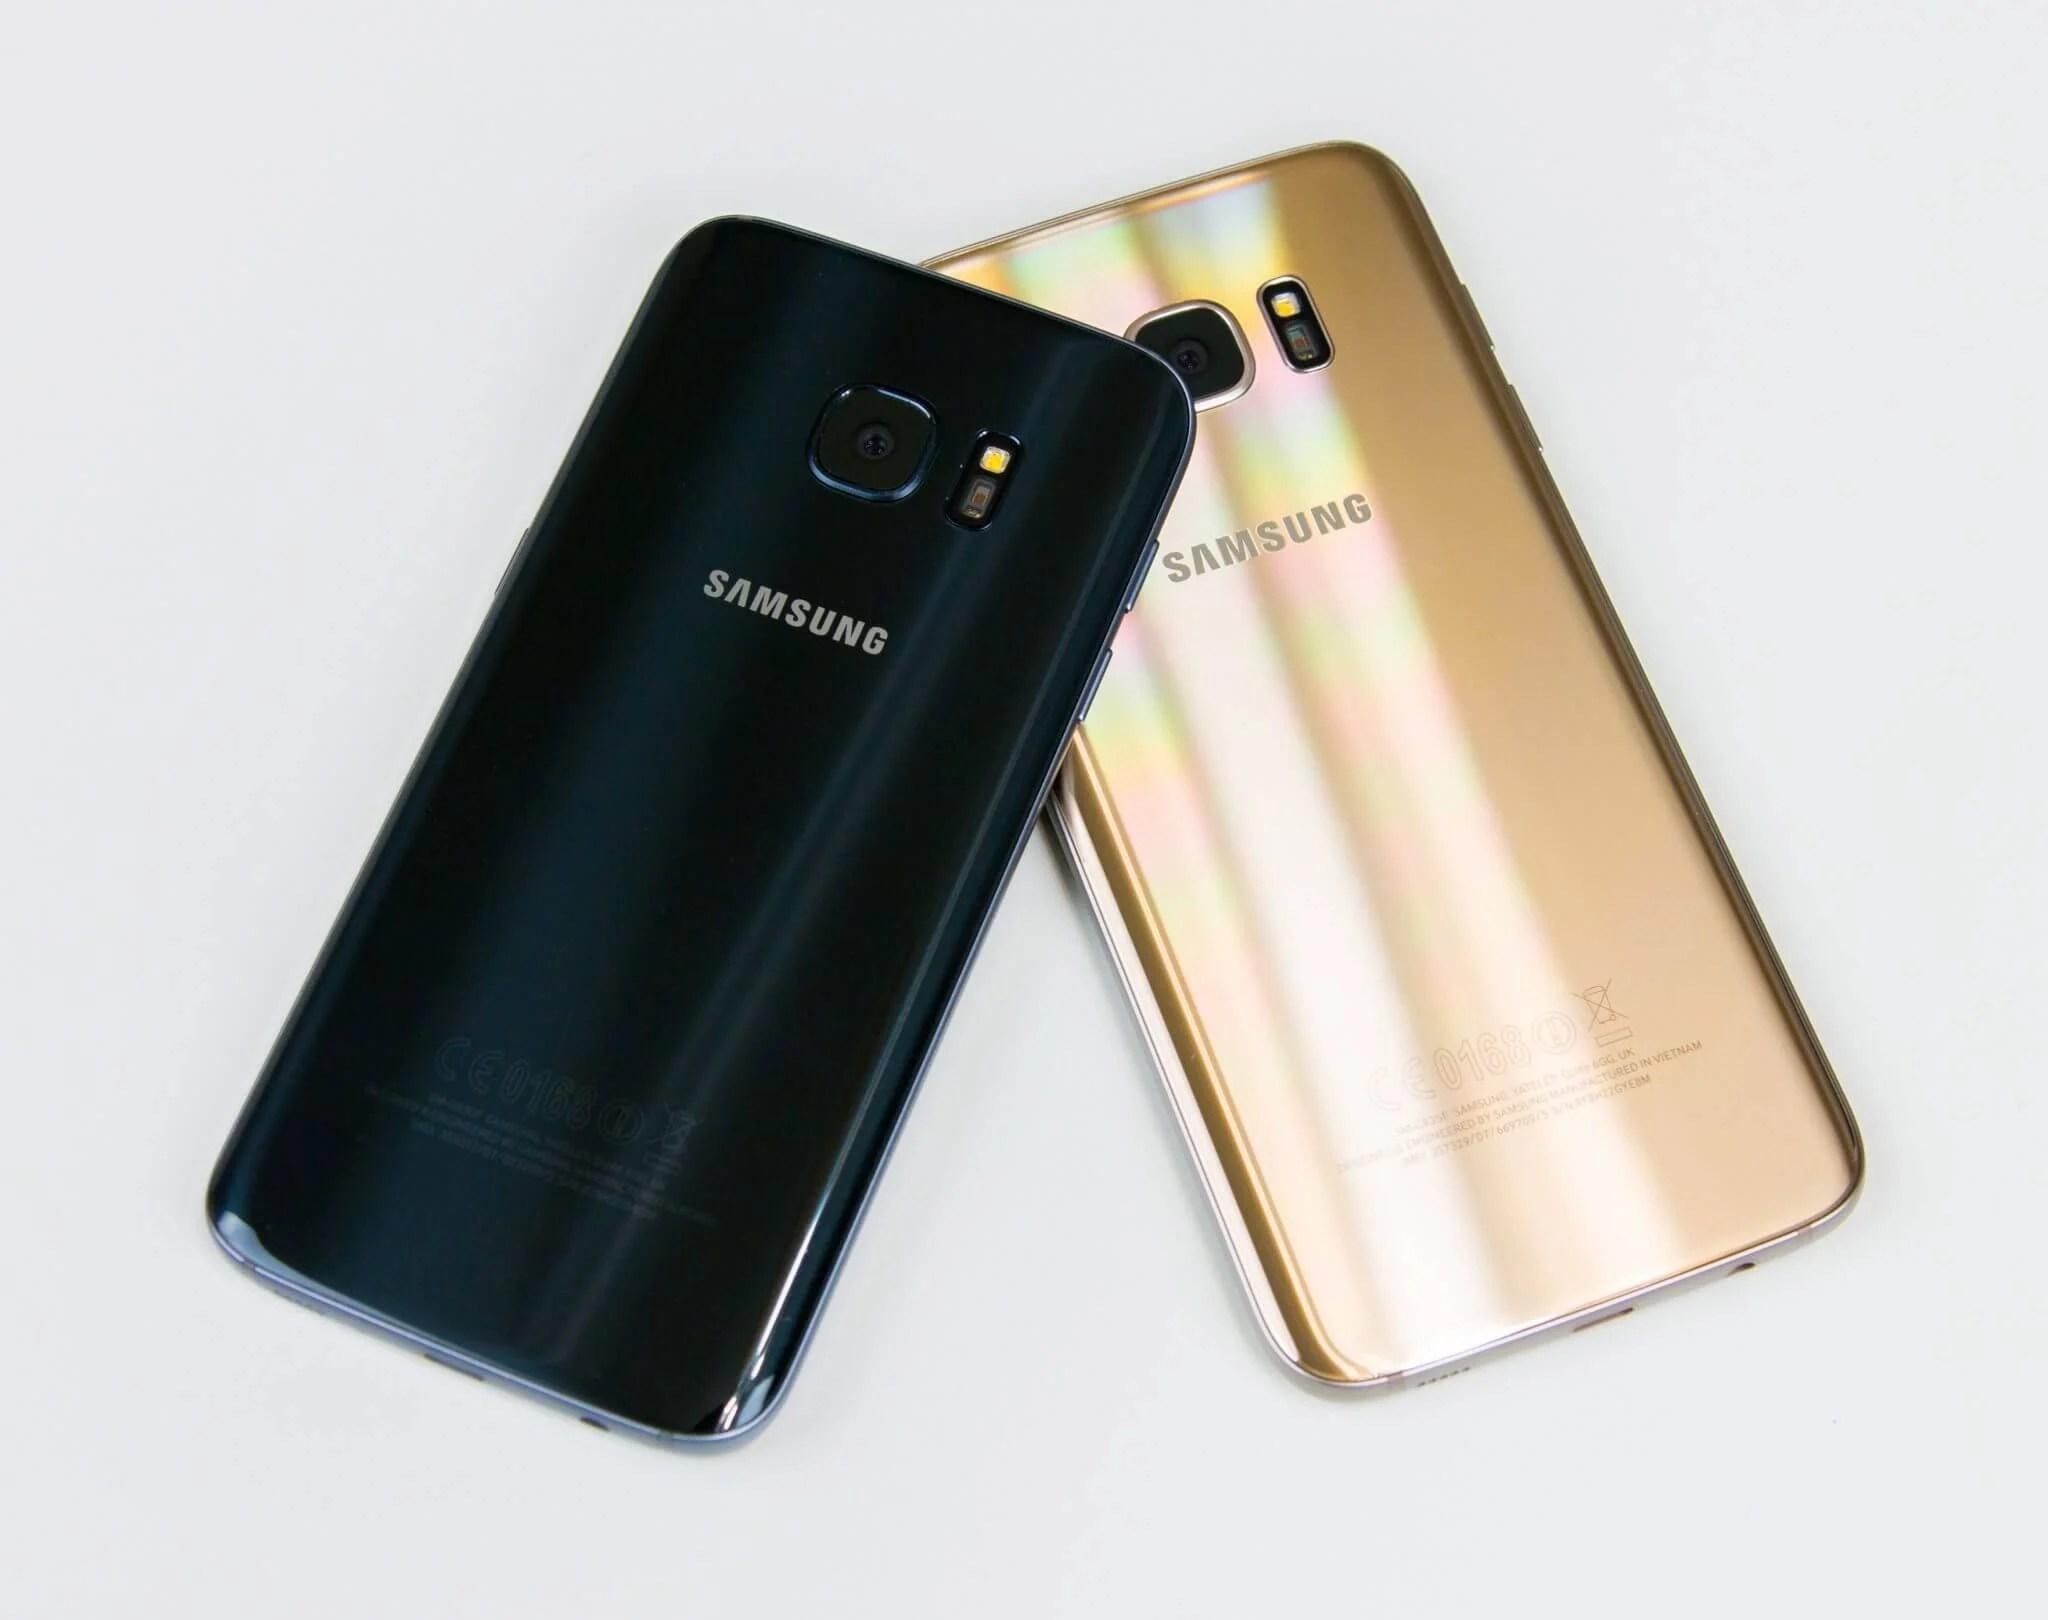 Samsung Galaxy S7 vs S7 Edge 11 - Samsung inicia o programa beta do Android 7.0 Nougat para o Galaxy S7/S7 Edge